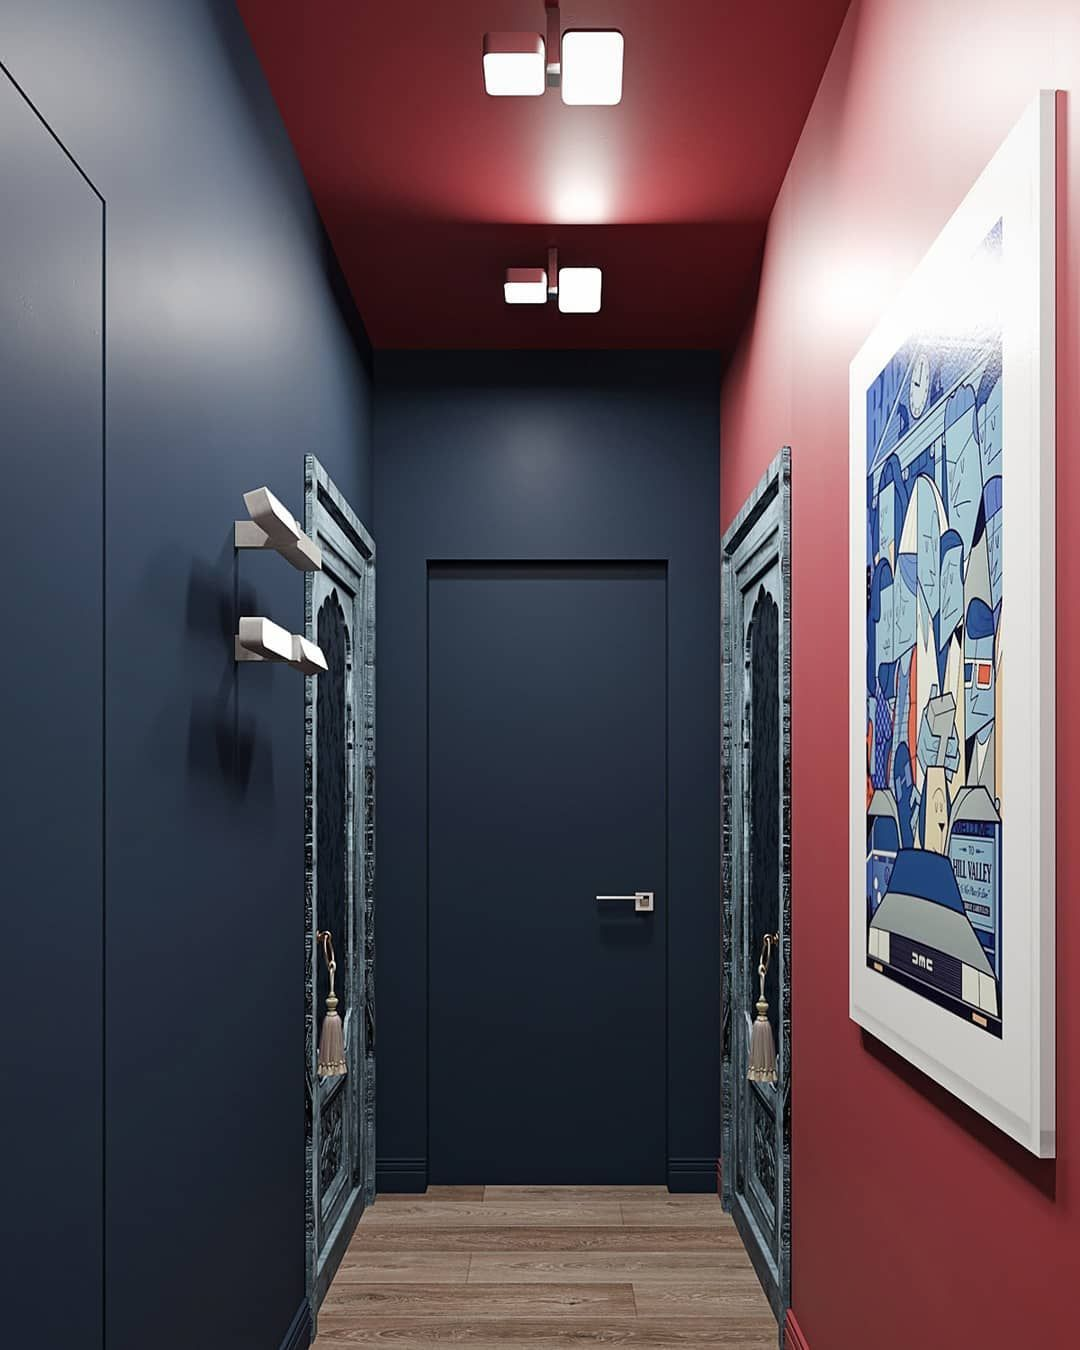 Living Room Design Hdb Flat: Interior Design 4 #interior Design 4 Room Hdb Flat